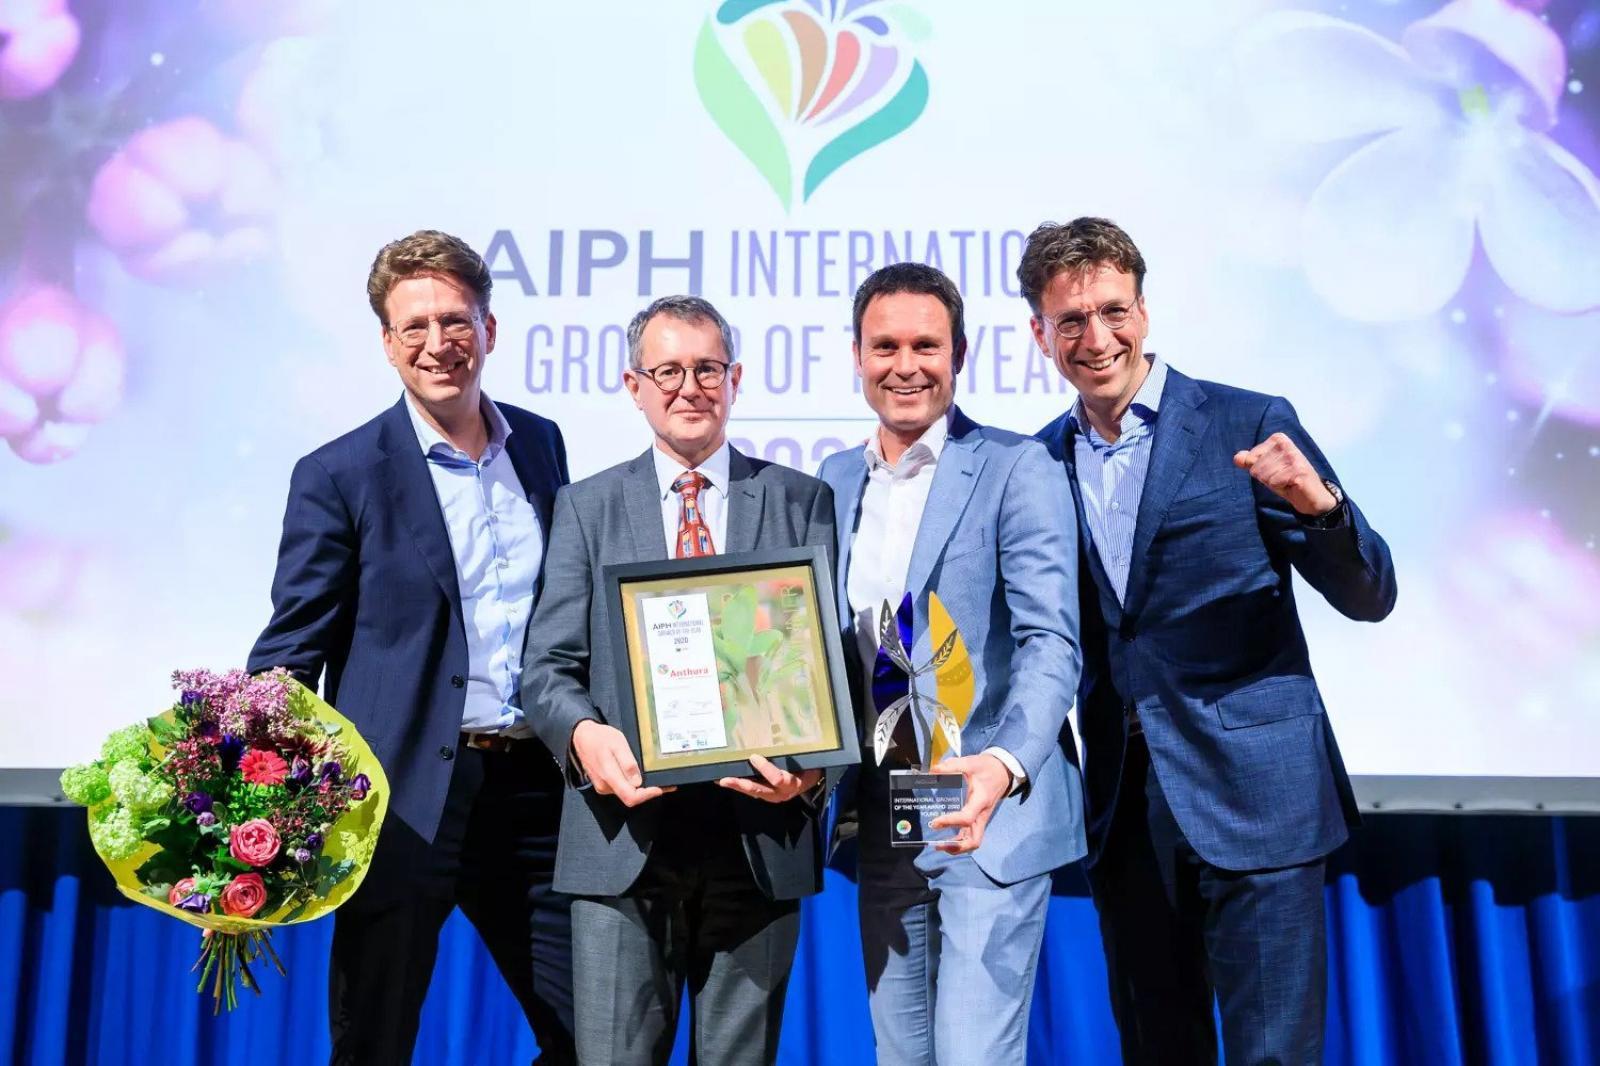 Enter the prestigious AIPH International Grower of the Year Awards 2022